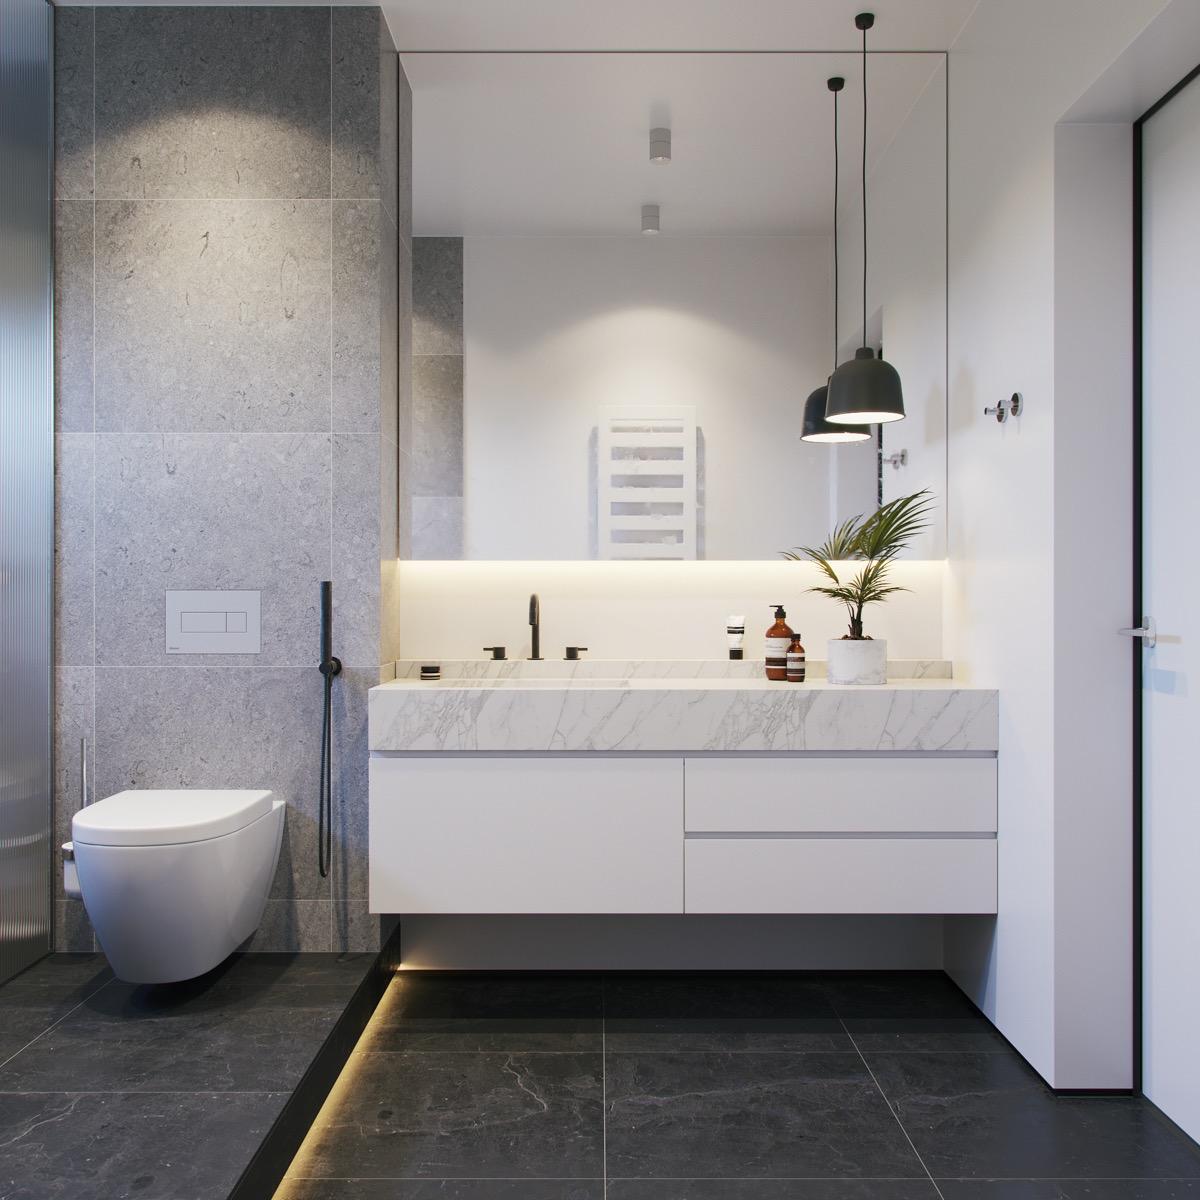 36 Modern Grey & White Bathrooms That Relax Mind Body & Soul on Restroom Ideas  id=97718